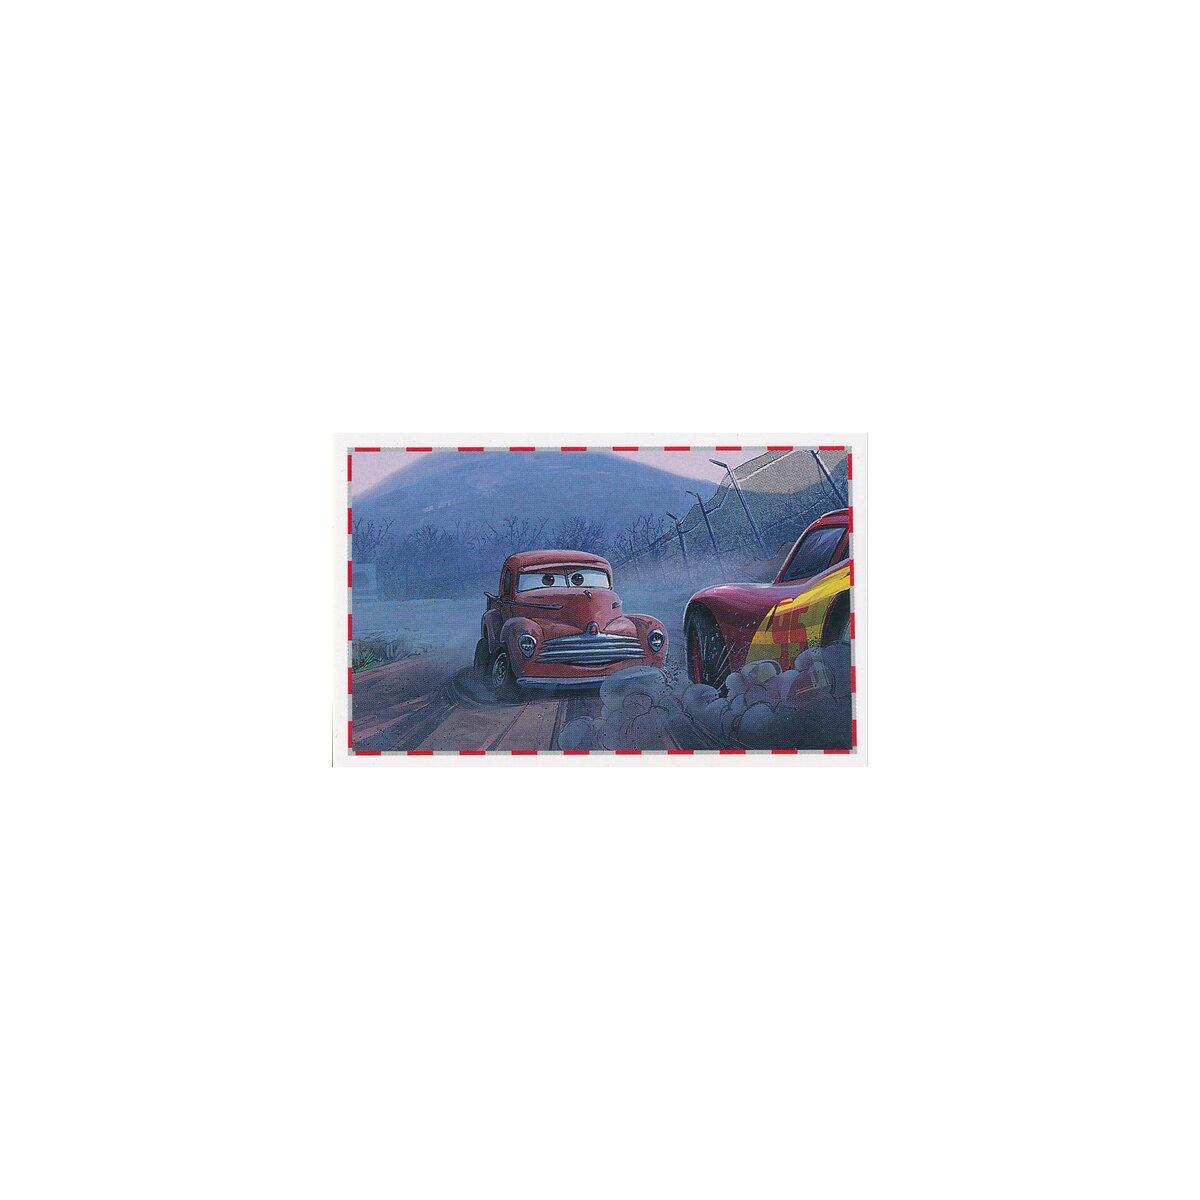 Panini-Cars 3 sammelsticker-Sticker 157